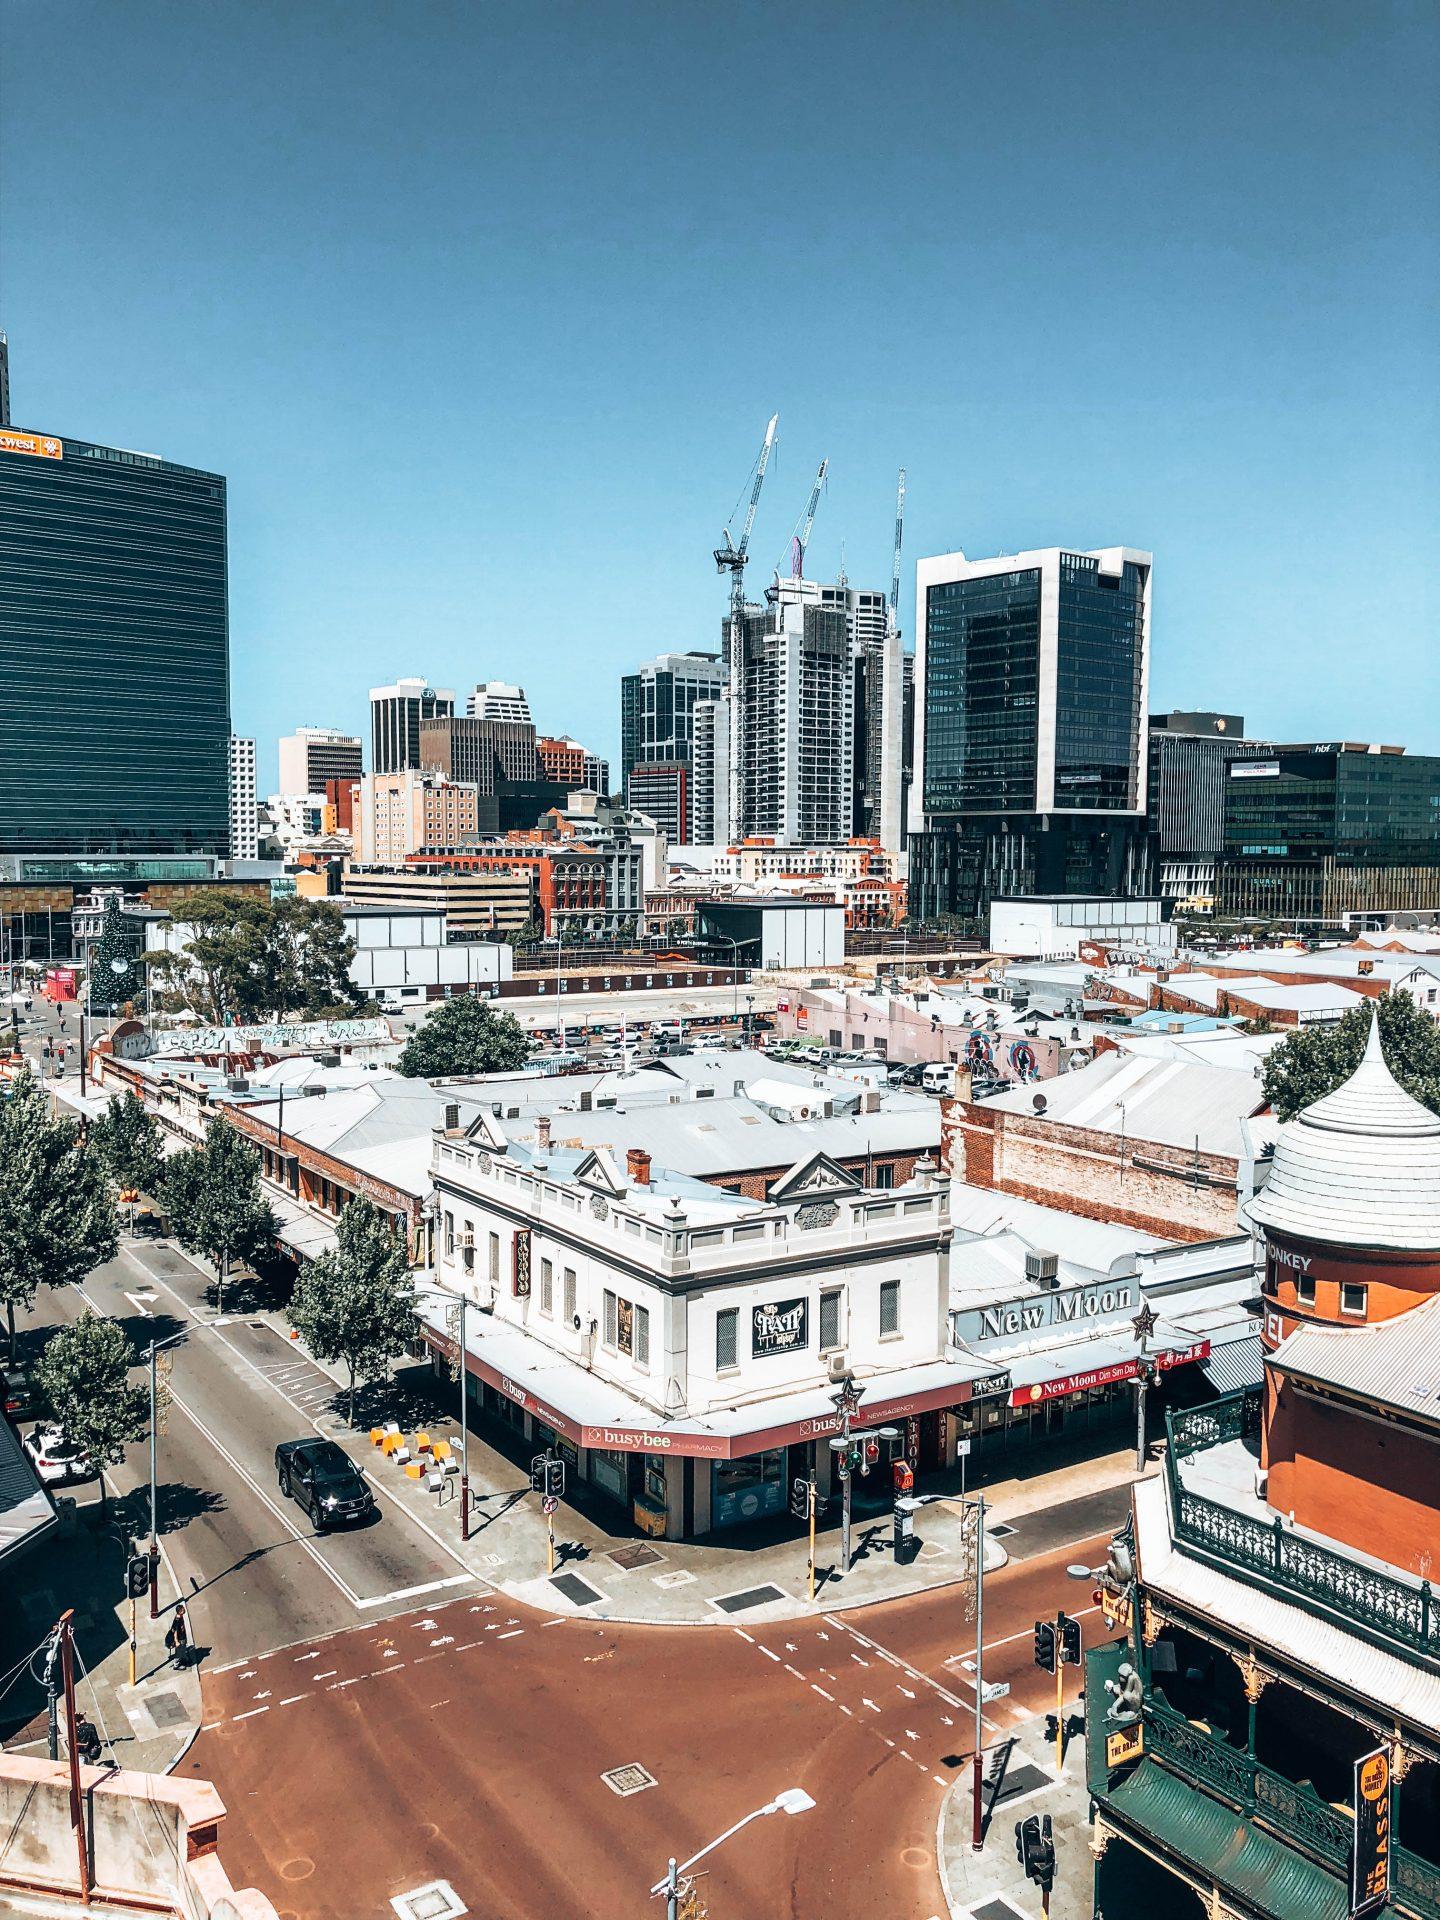 Visiter Perth Australie - Blondie Baby blog mode et voyages